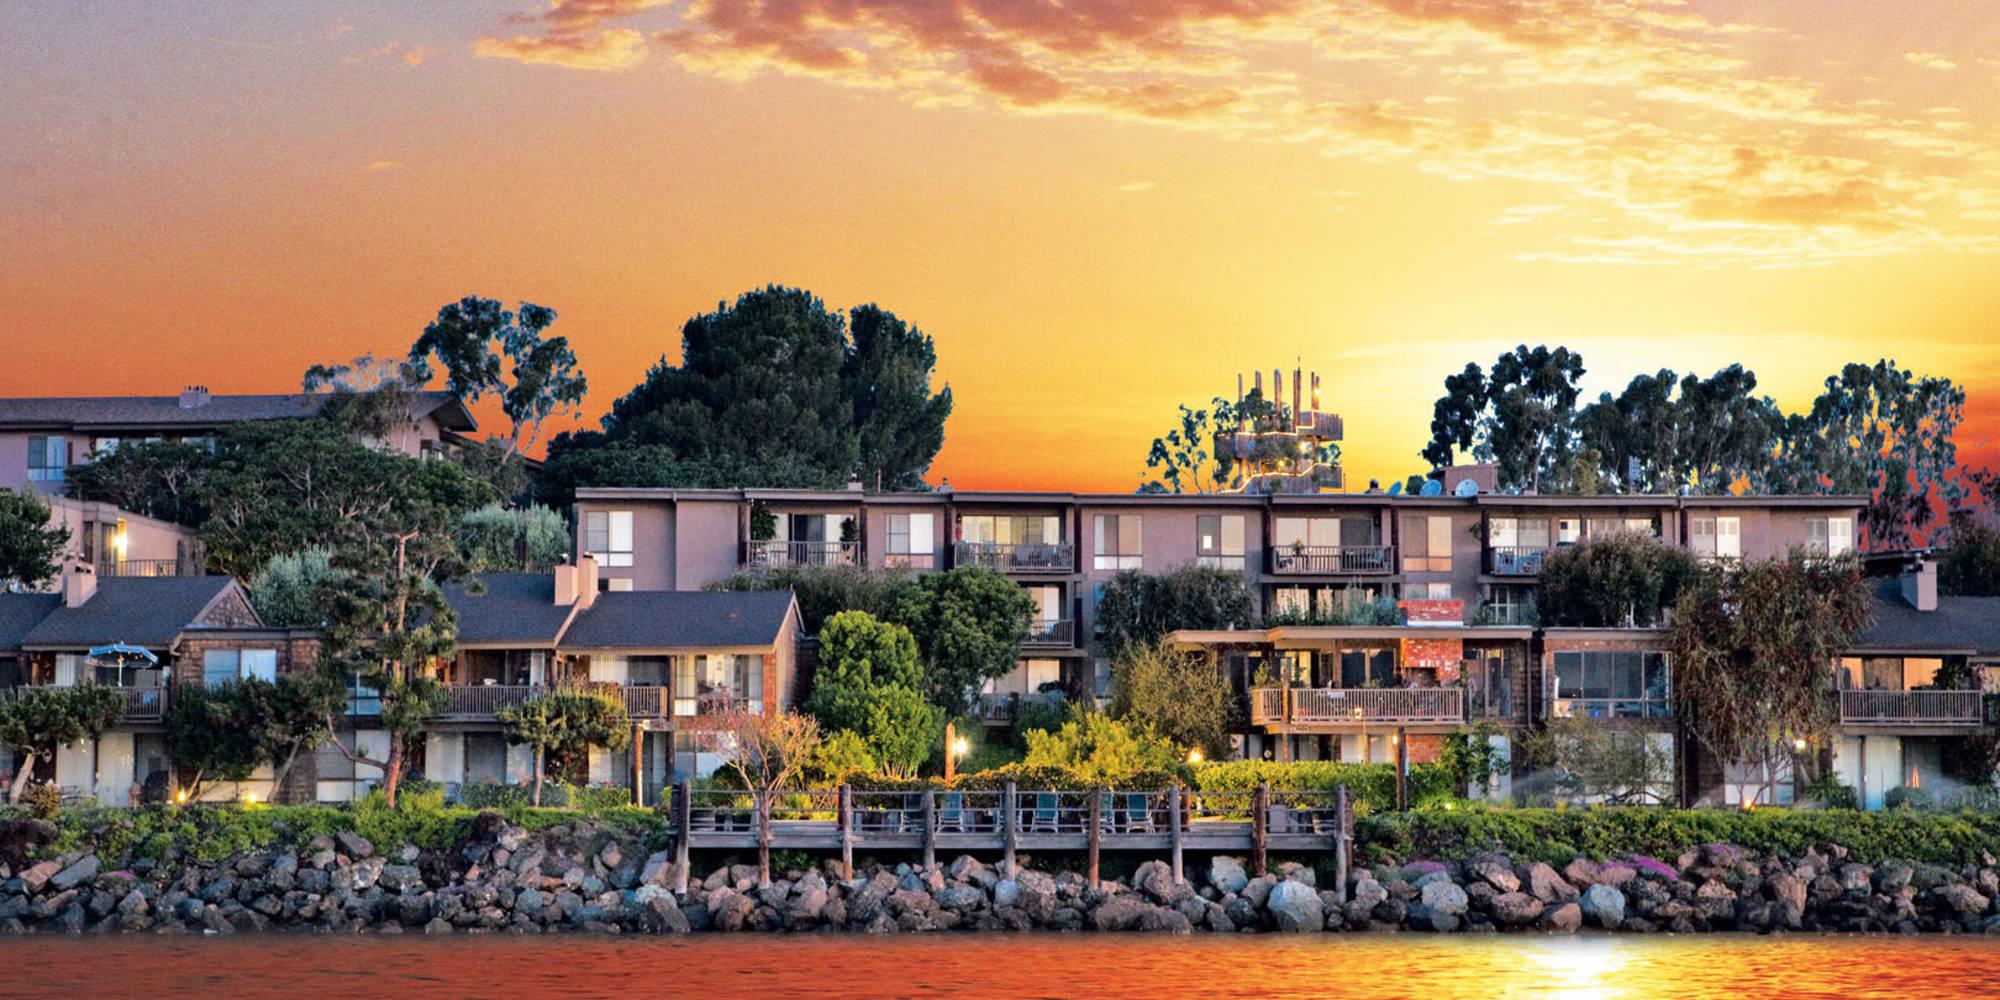 Sunset over Mariners Village in Marina del Rey, California